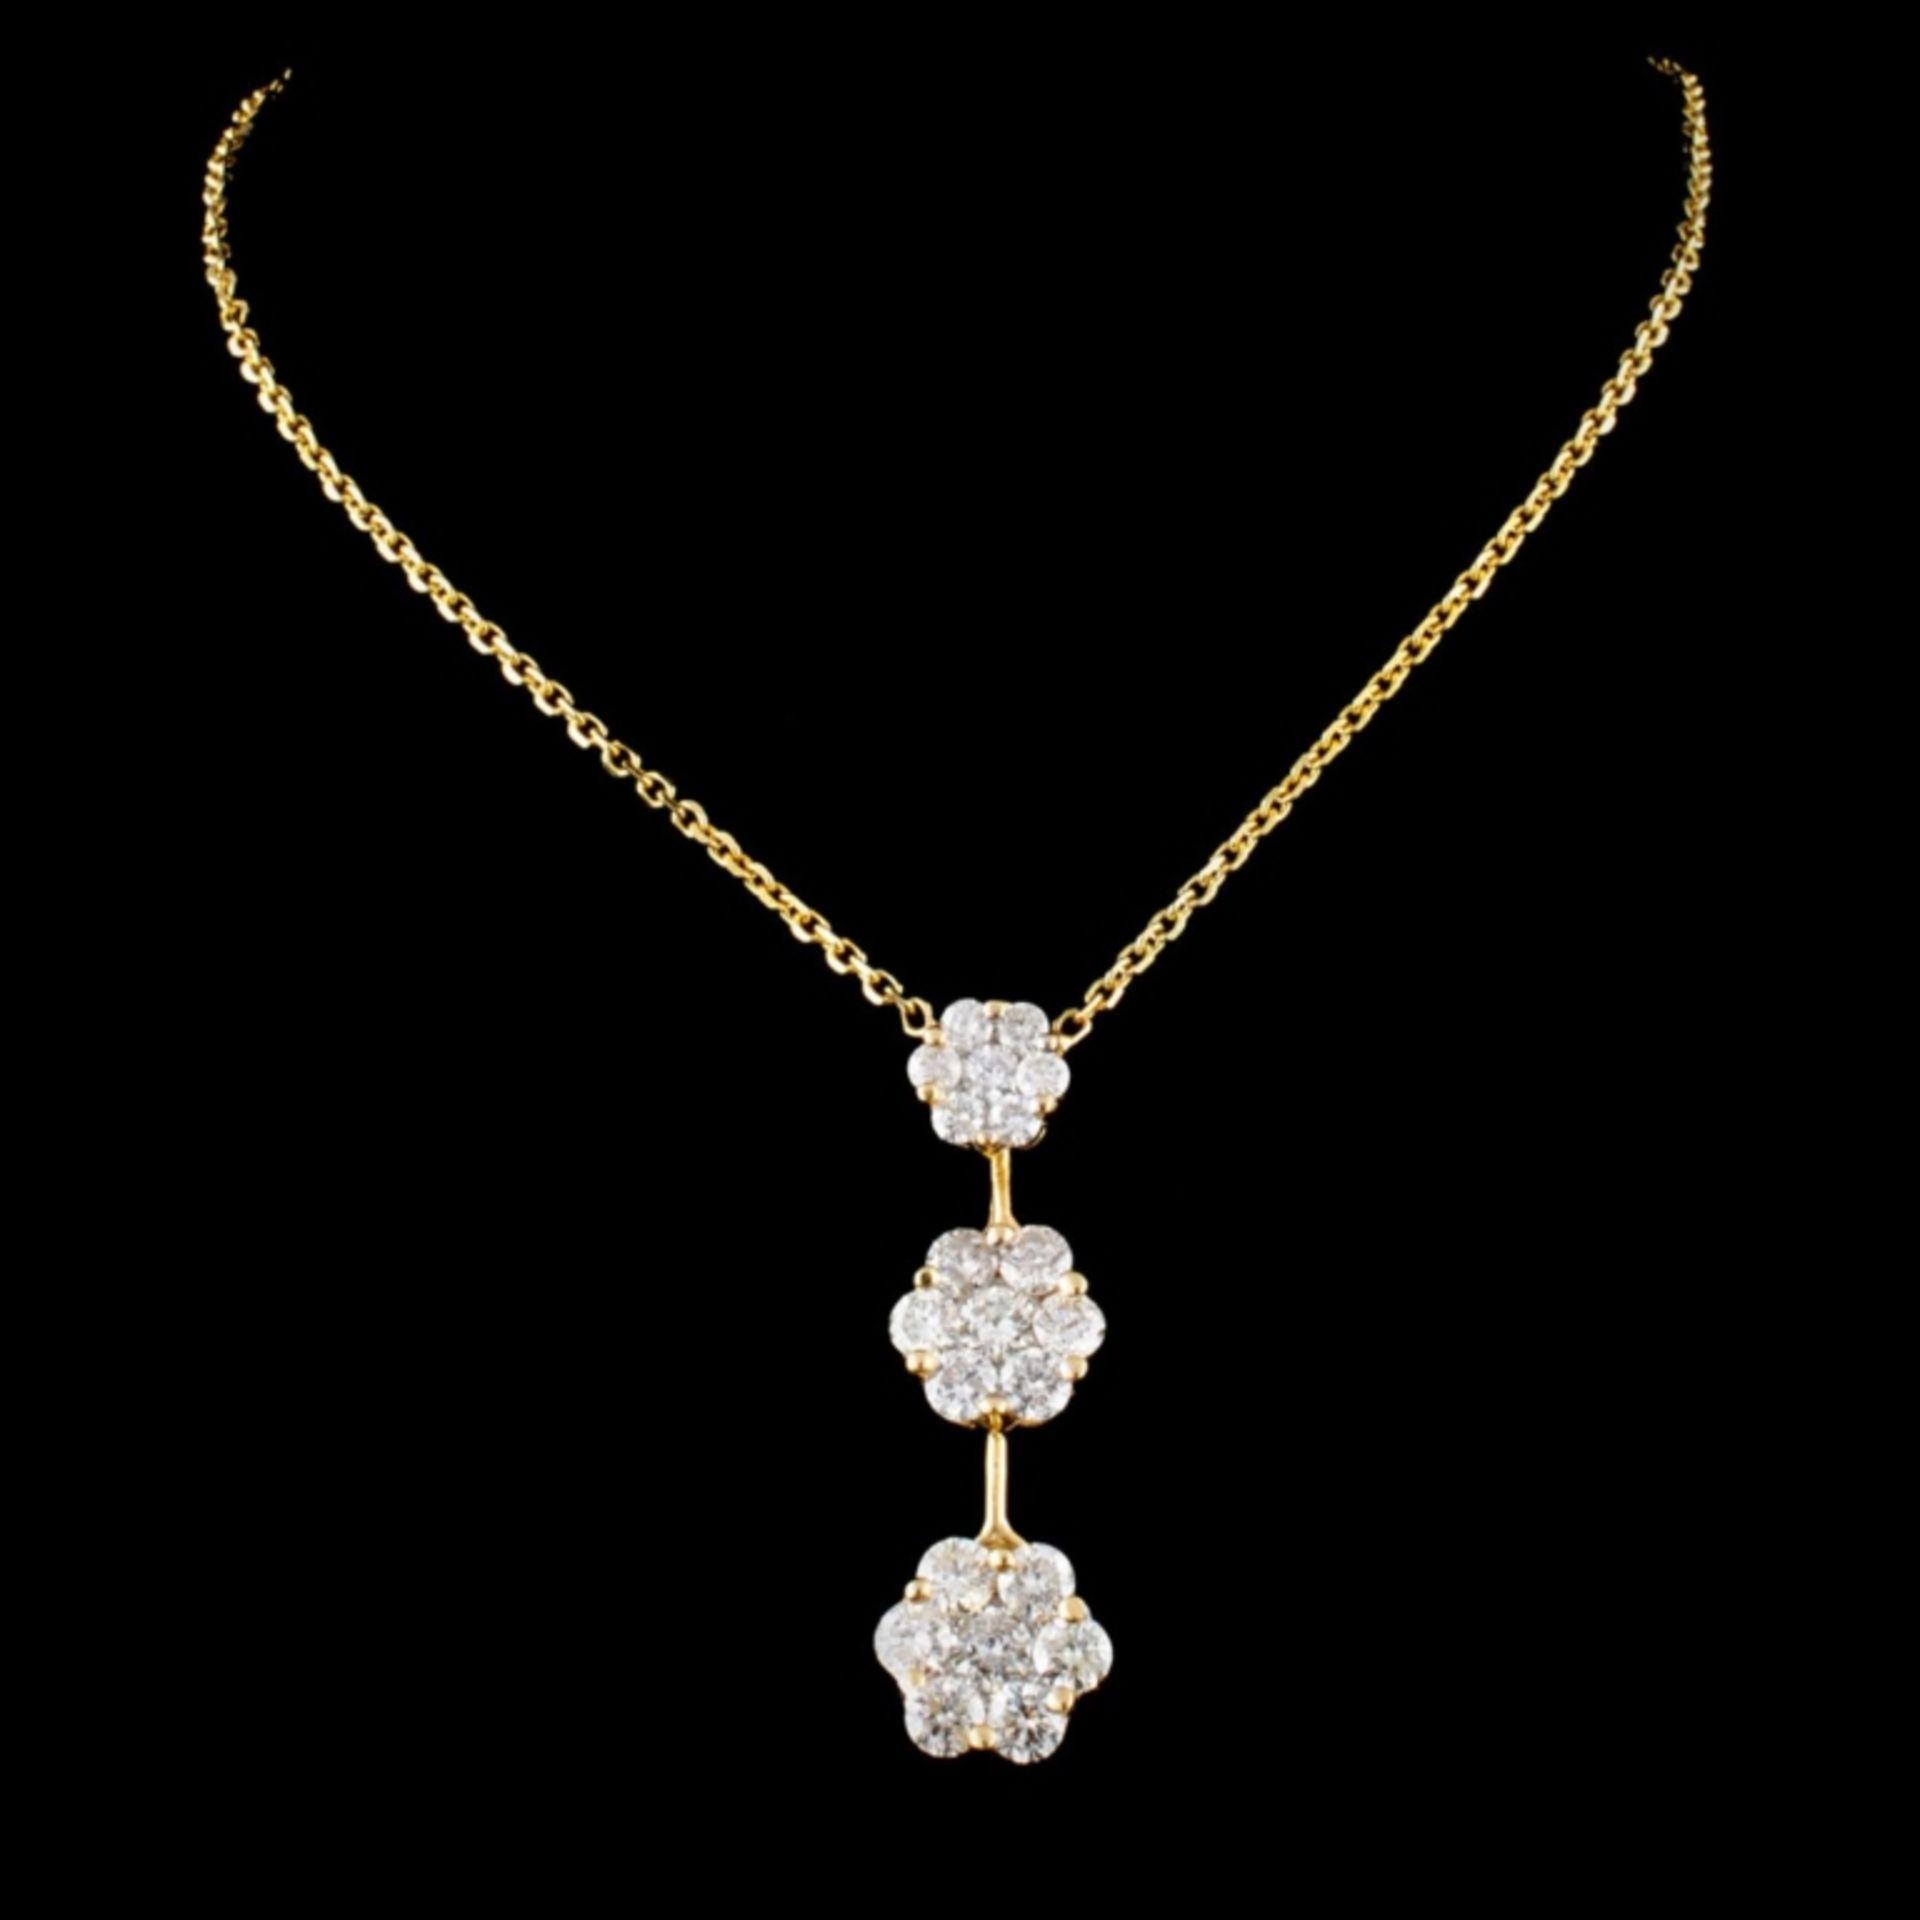 14K Gold 2.10ctw Diamond Necklace - Image 2 of 3